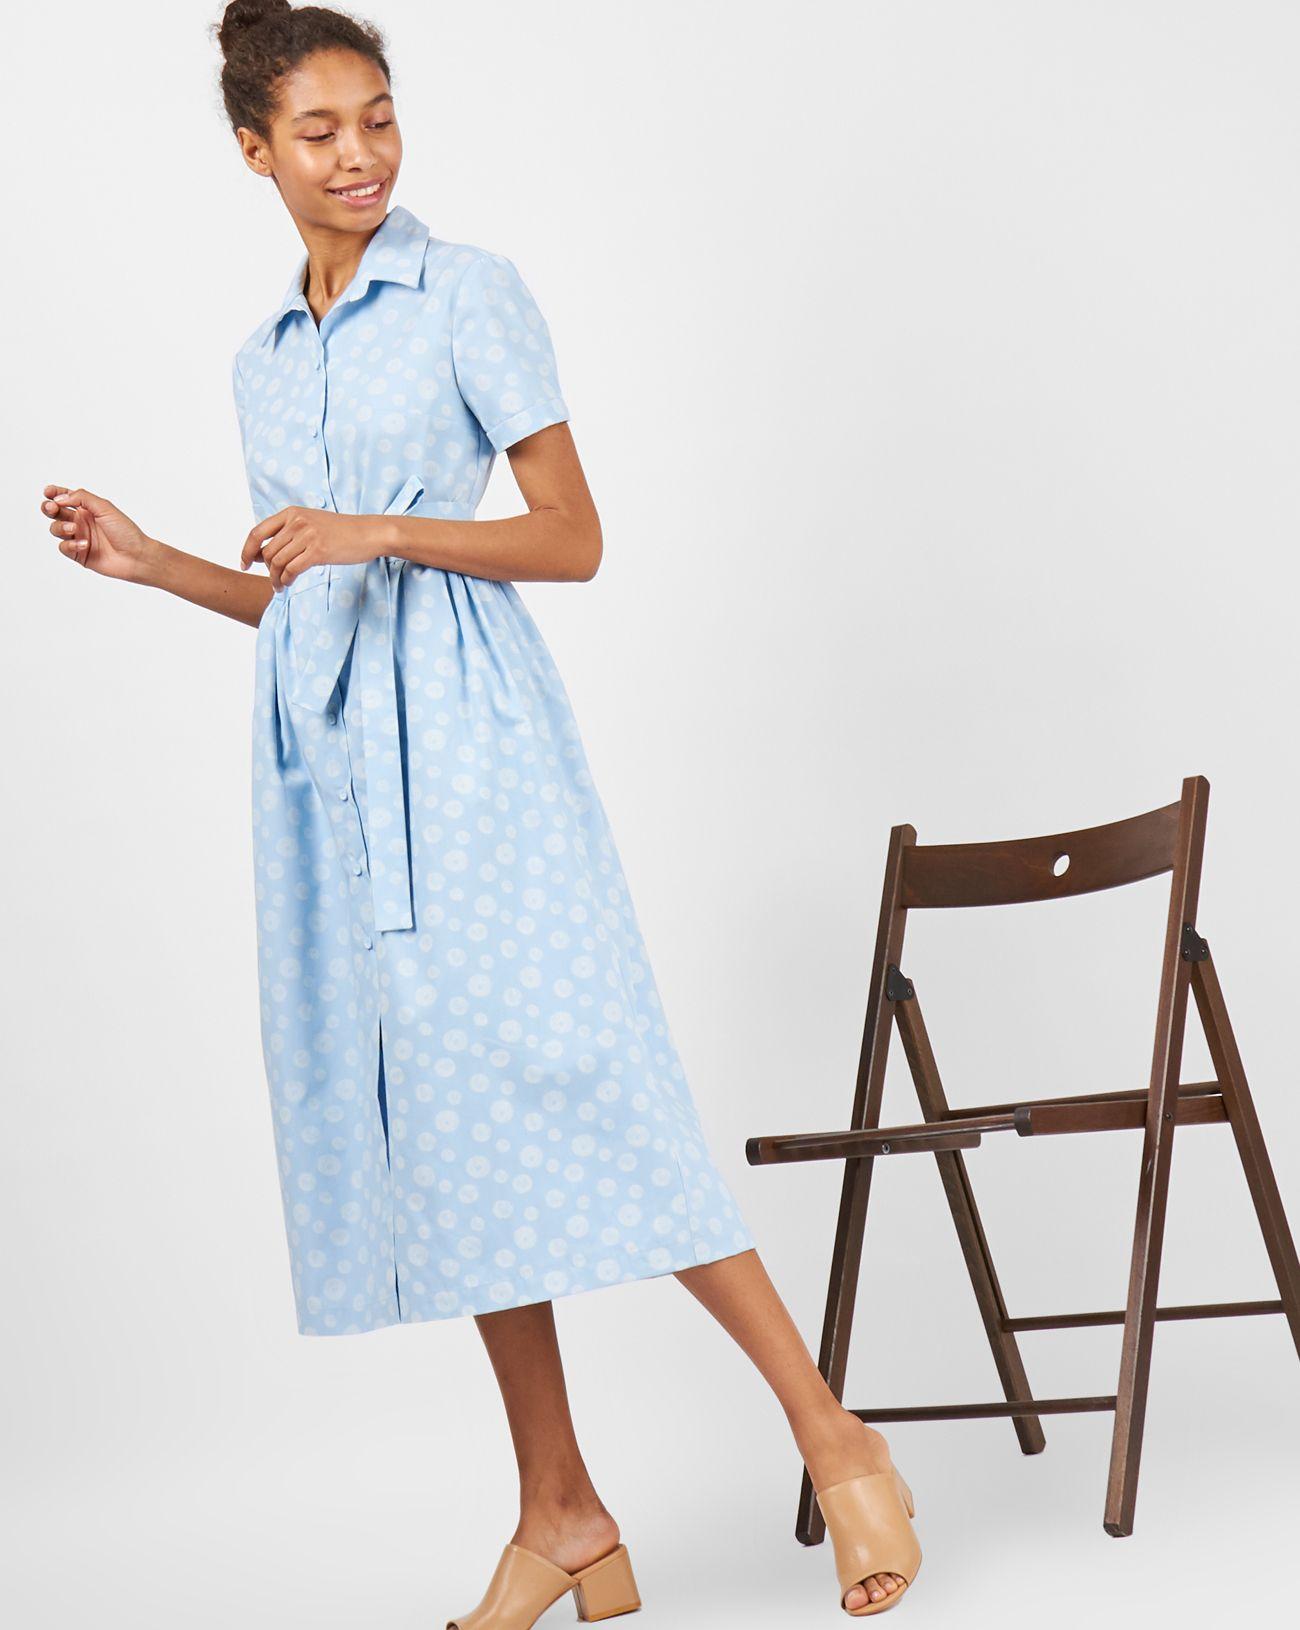 aec16ff07a9 Платье-рубашка миди с коротким рукавом на манжете. Классический воротник